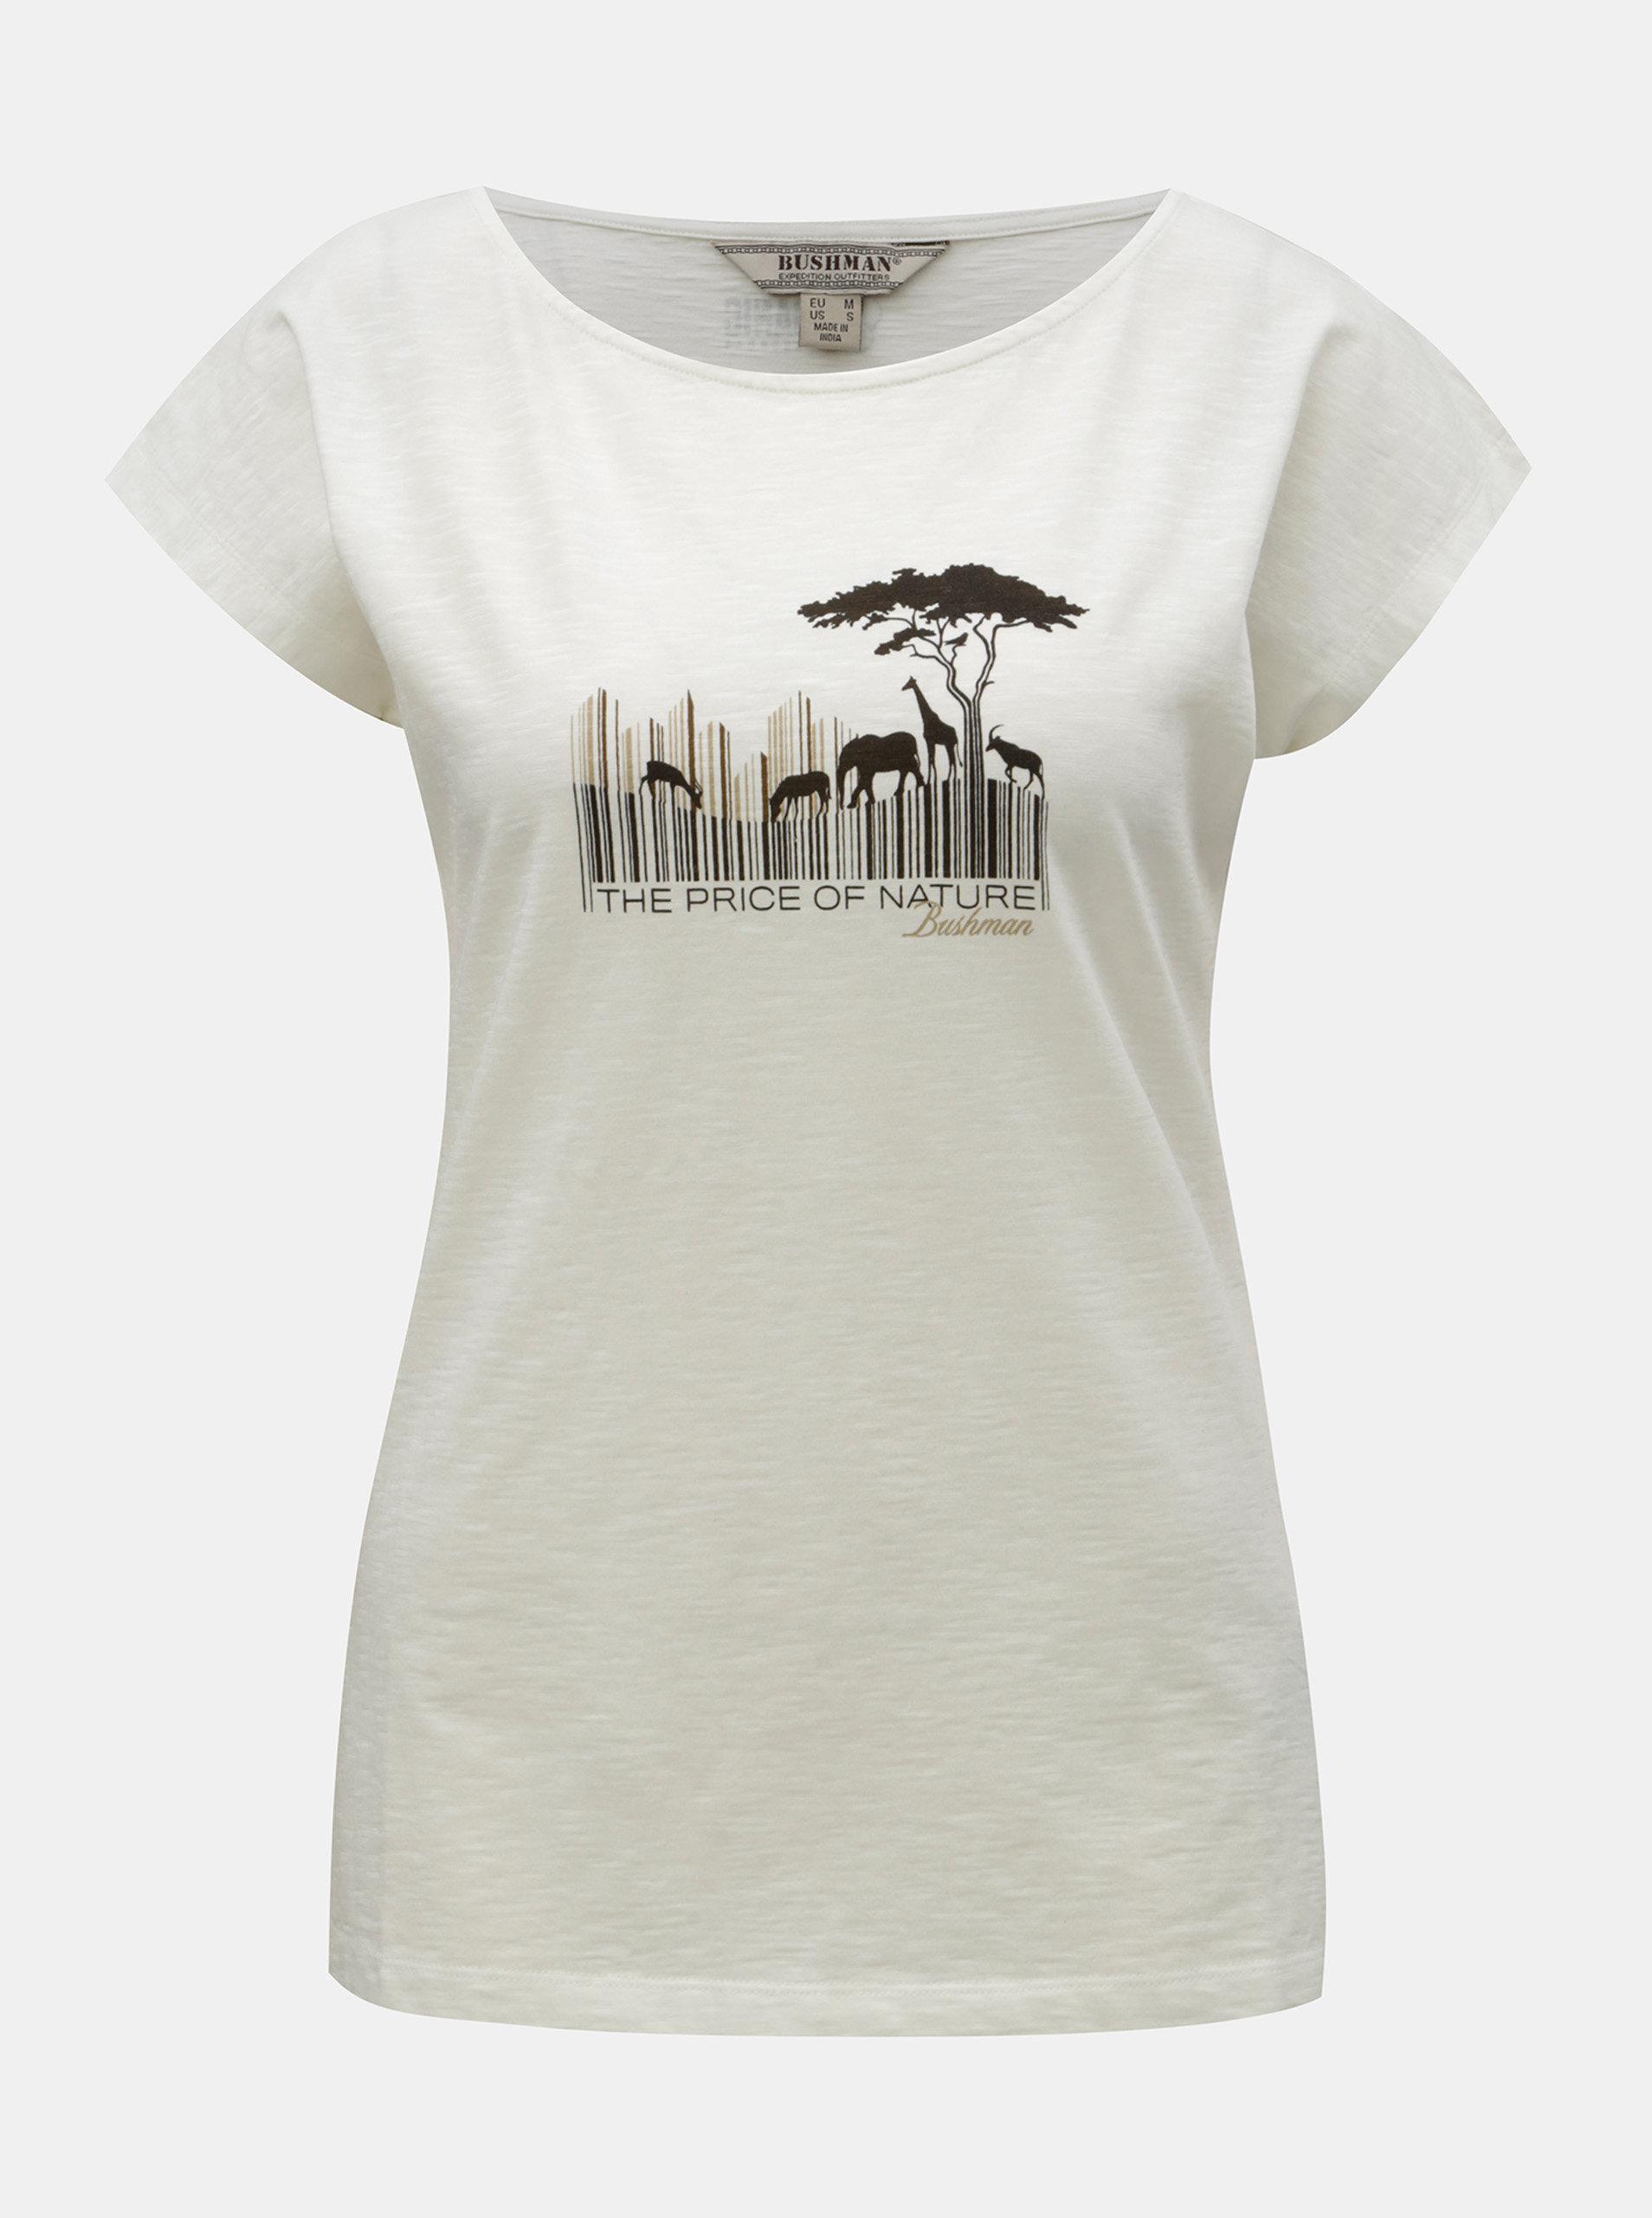 6aa9b44b92a Krémové dámské tričko s potiskem BUSHMAN Fredonia ...